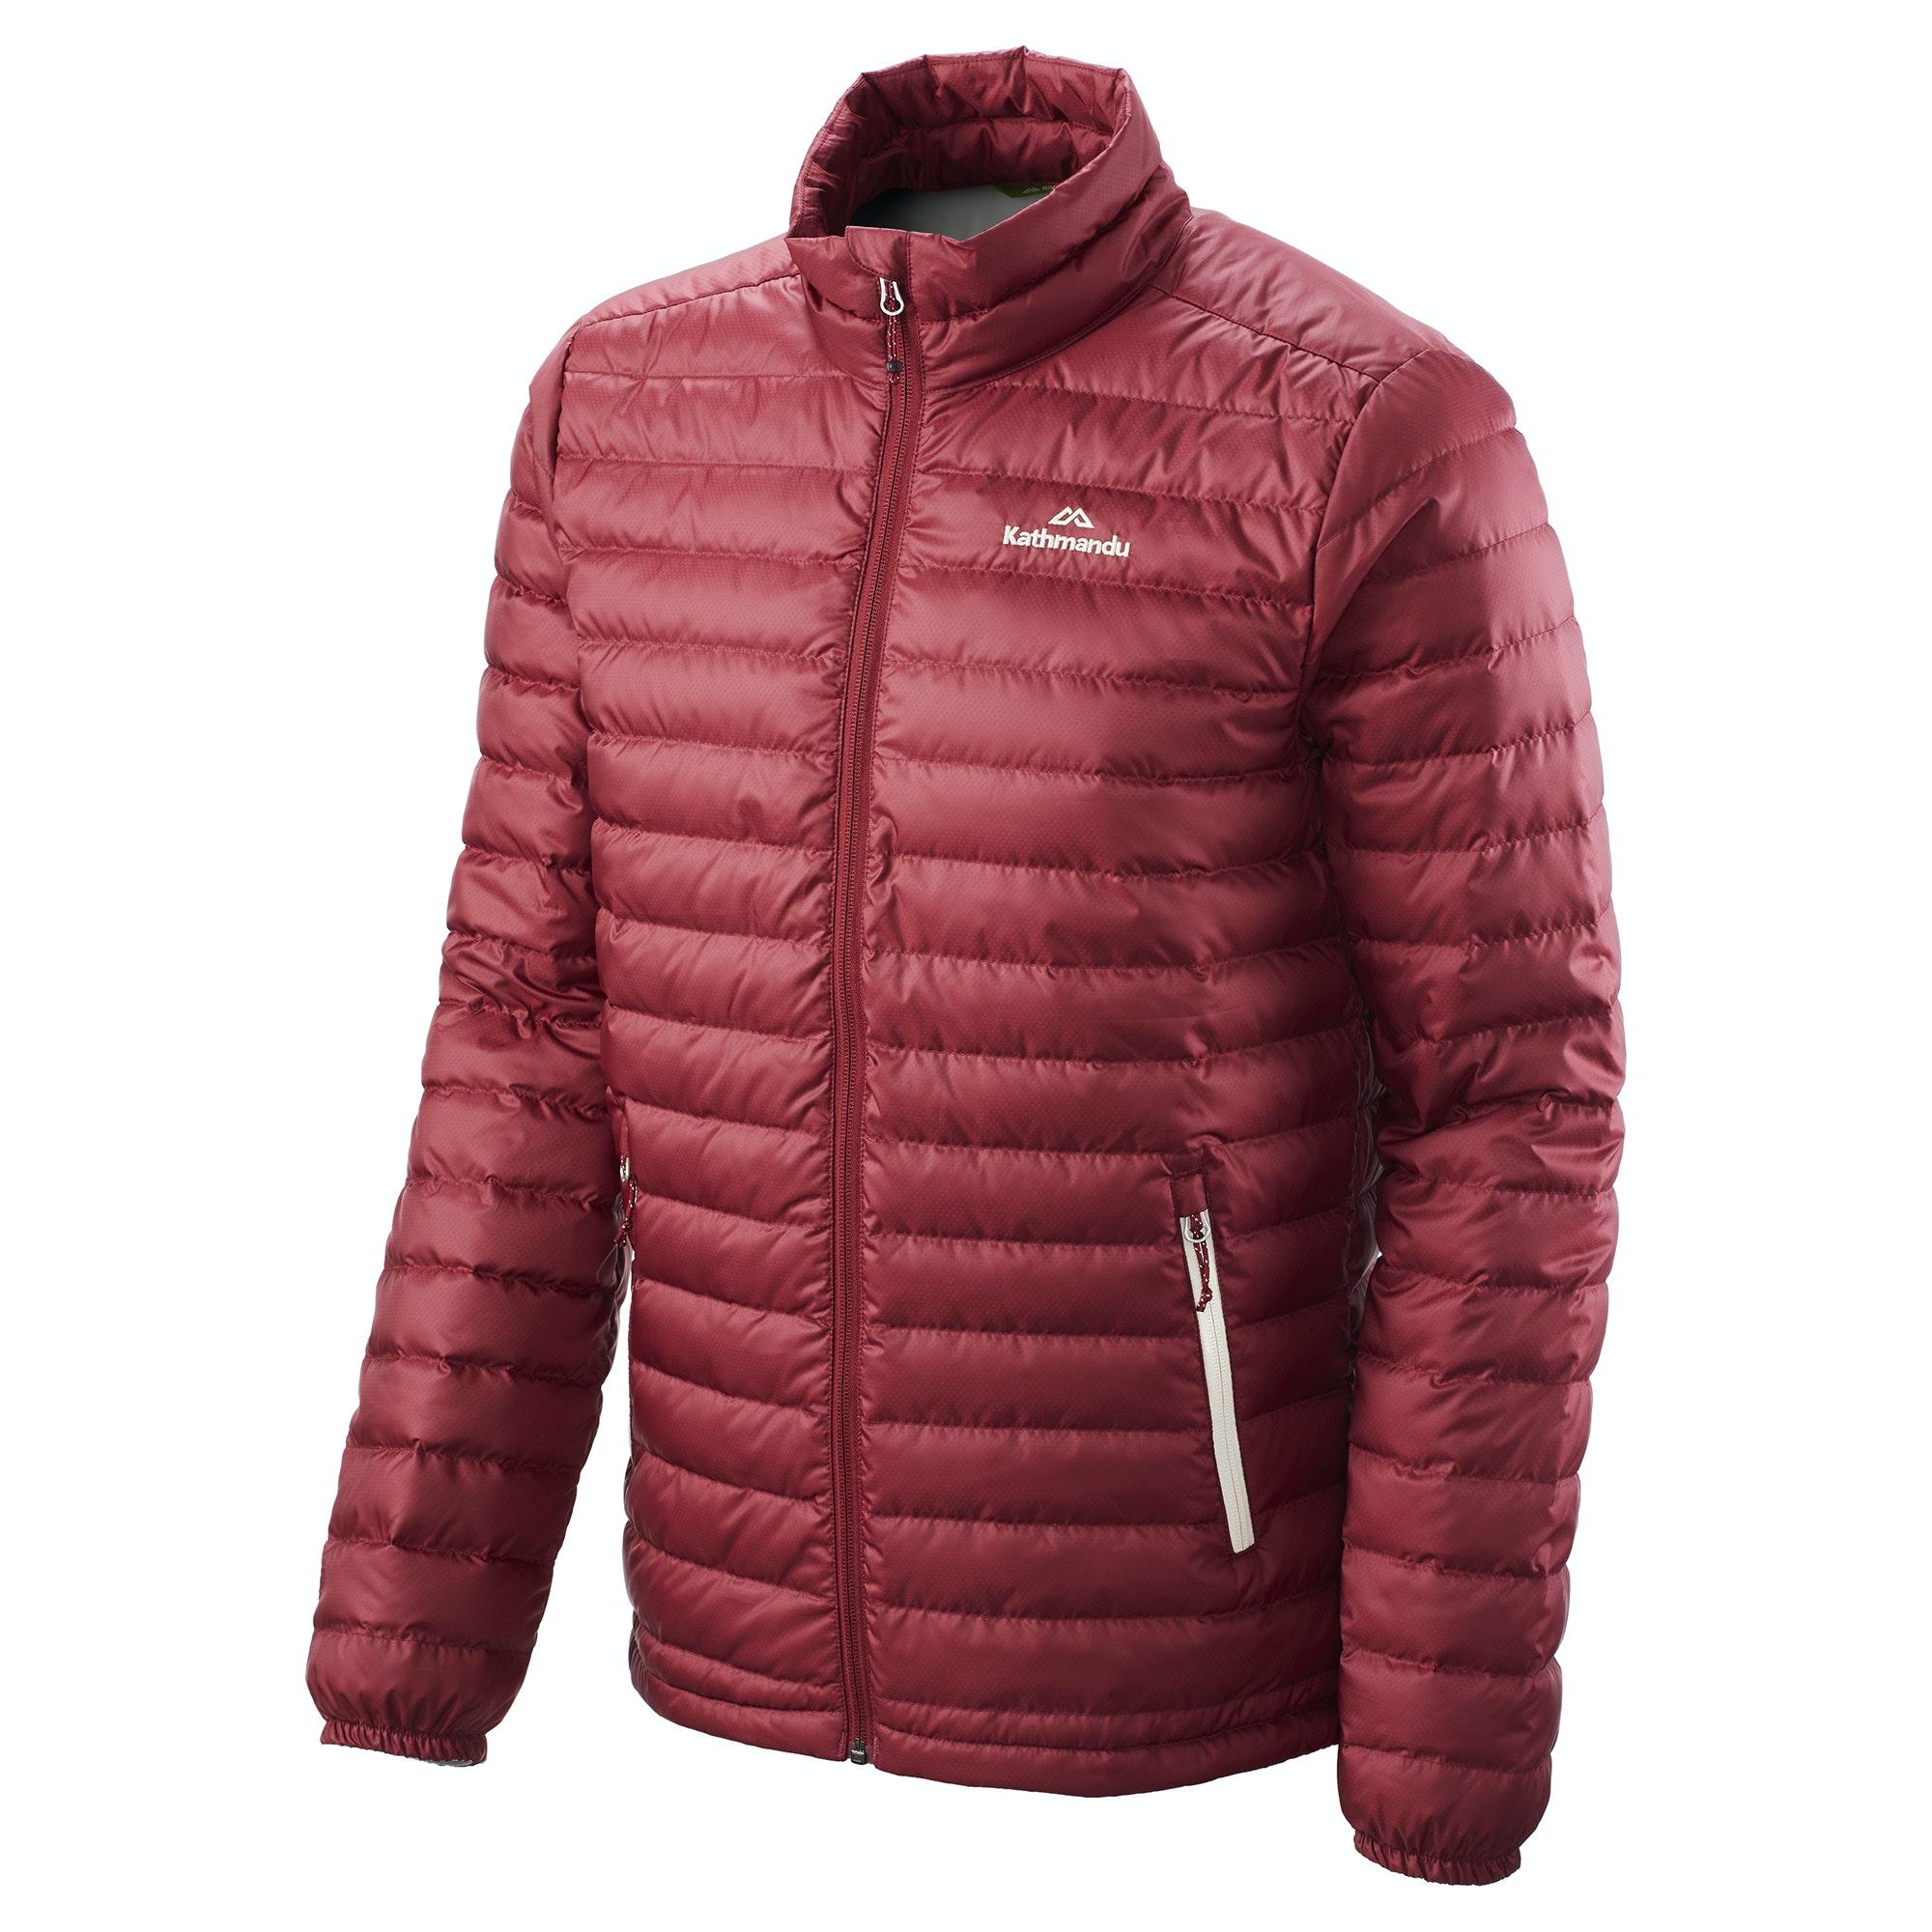 NEW-Kathmandu-Heli-Men-039-s-Lightweight-Duck-Down-Coat-Warm-Puffer-Jacket-v2 thumbnail 17